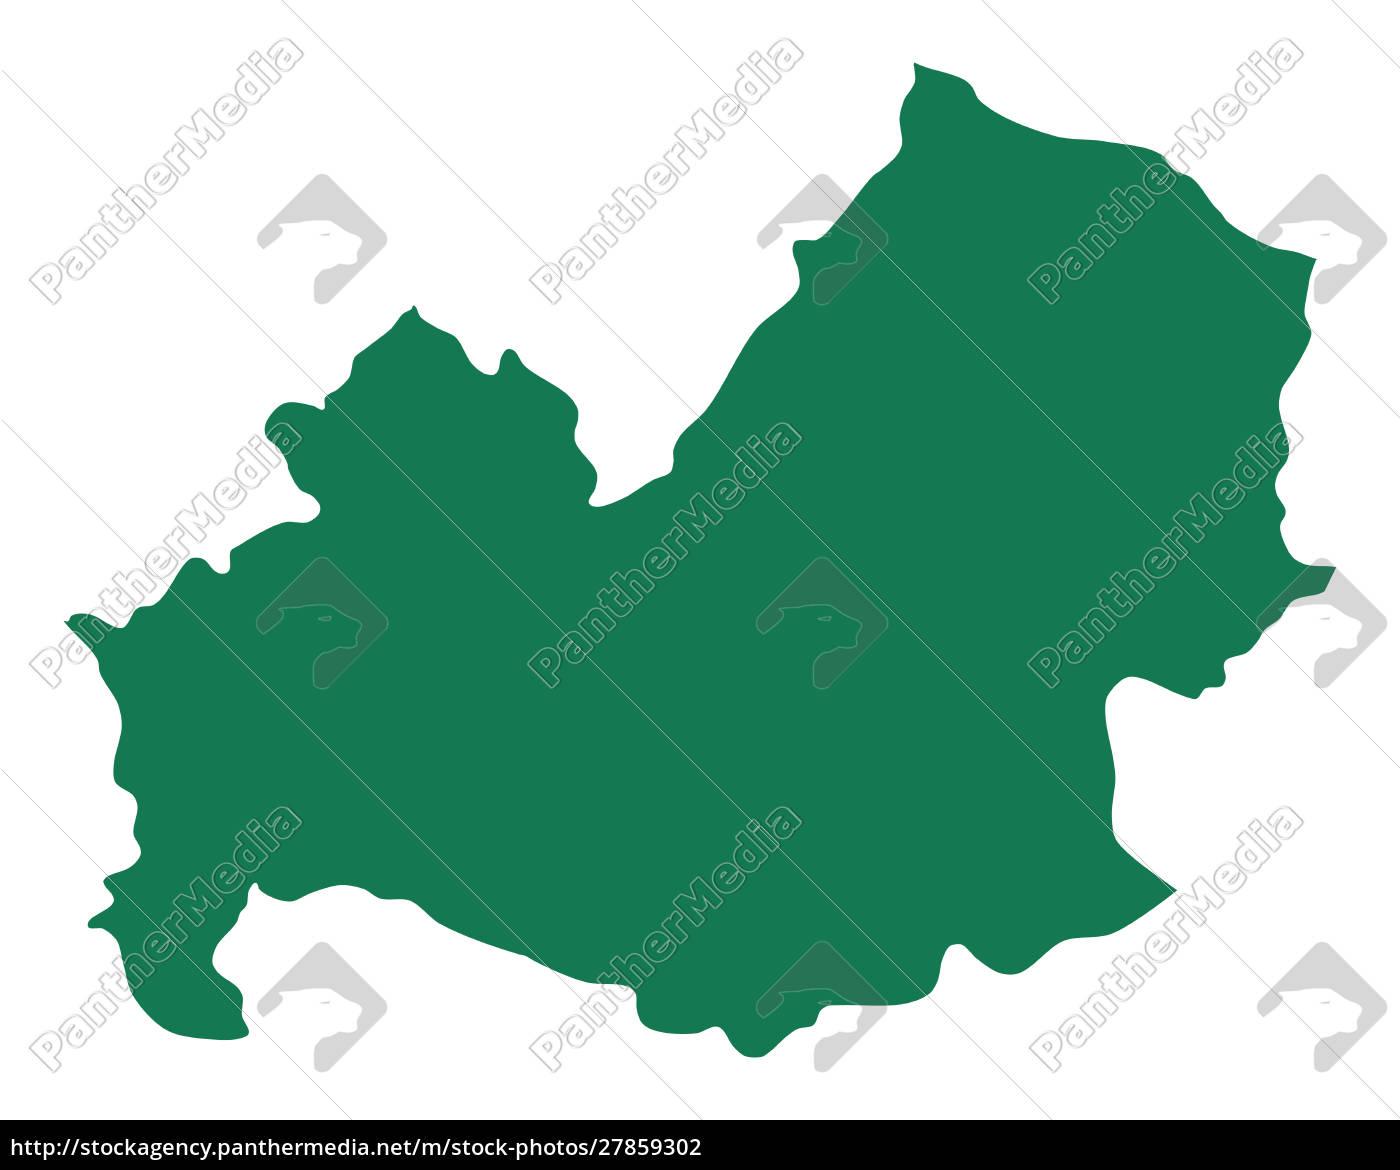 map, of, molise - 27859302